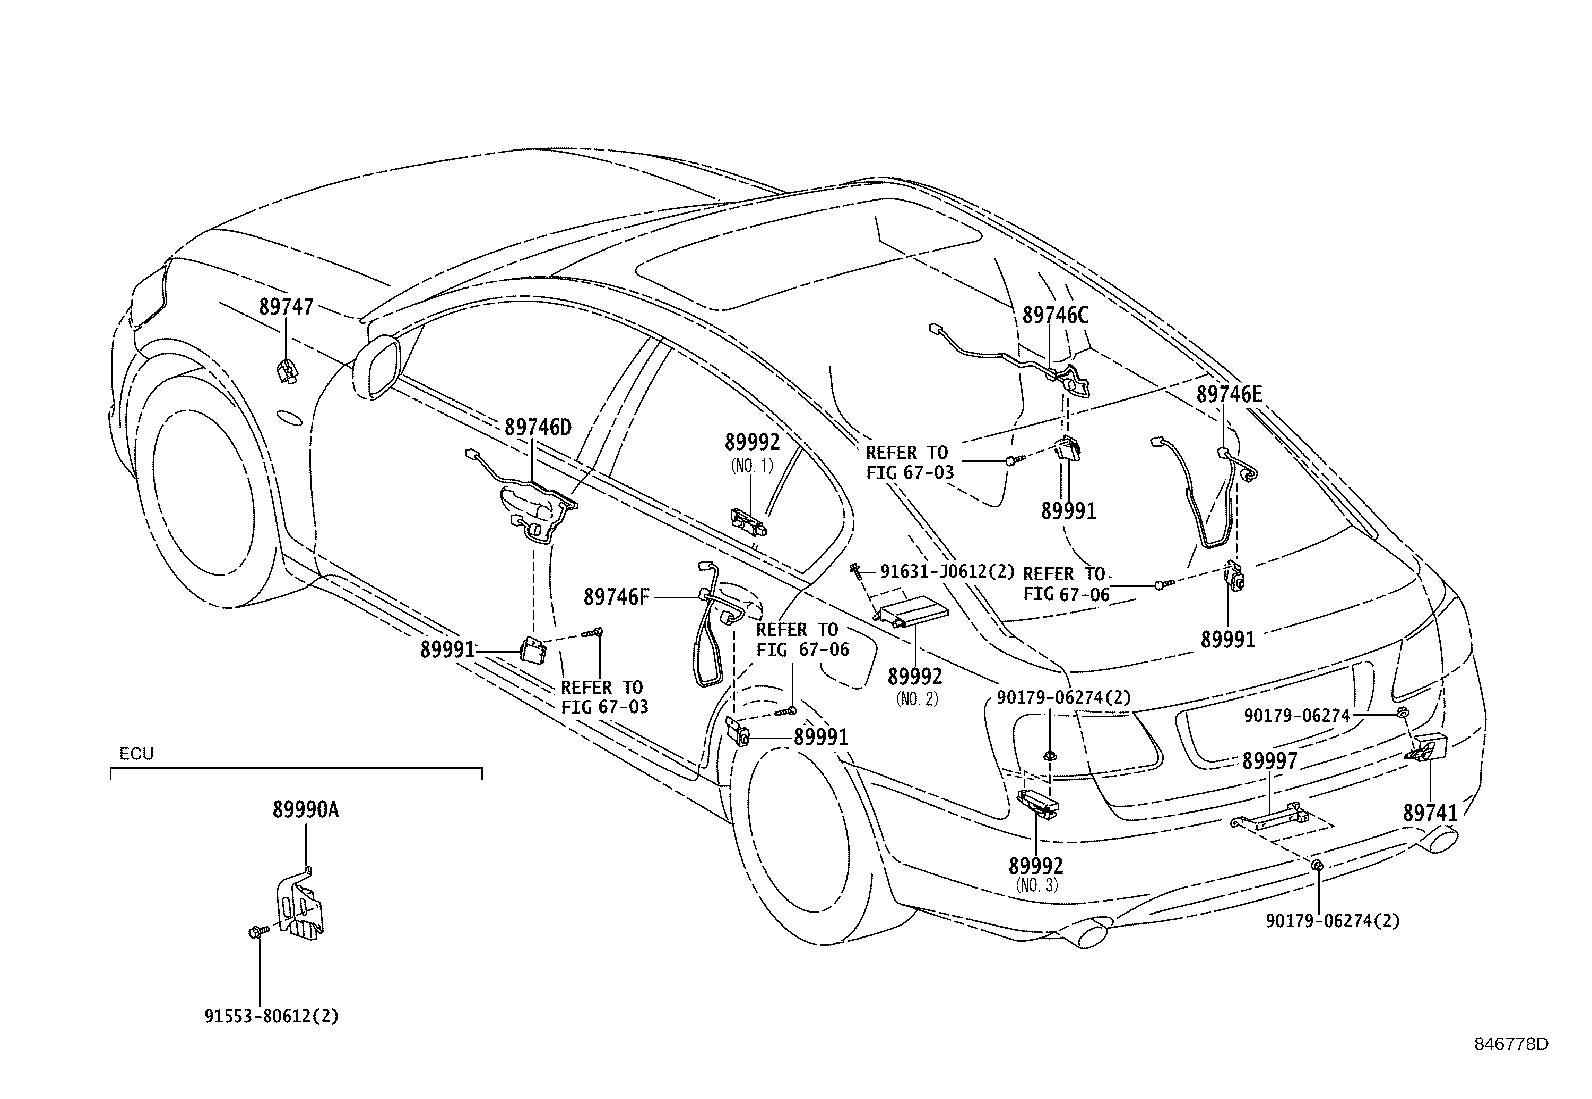 Lexus GS 350 Oscillator, indoor electrical key. System